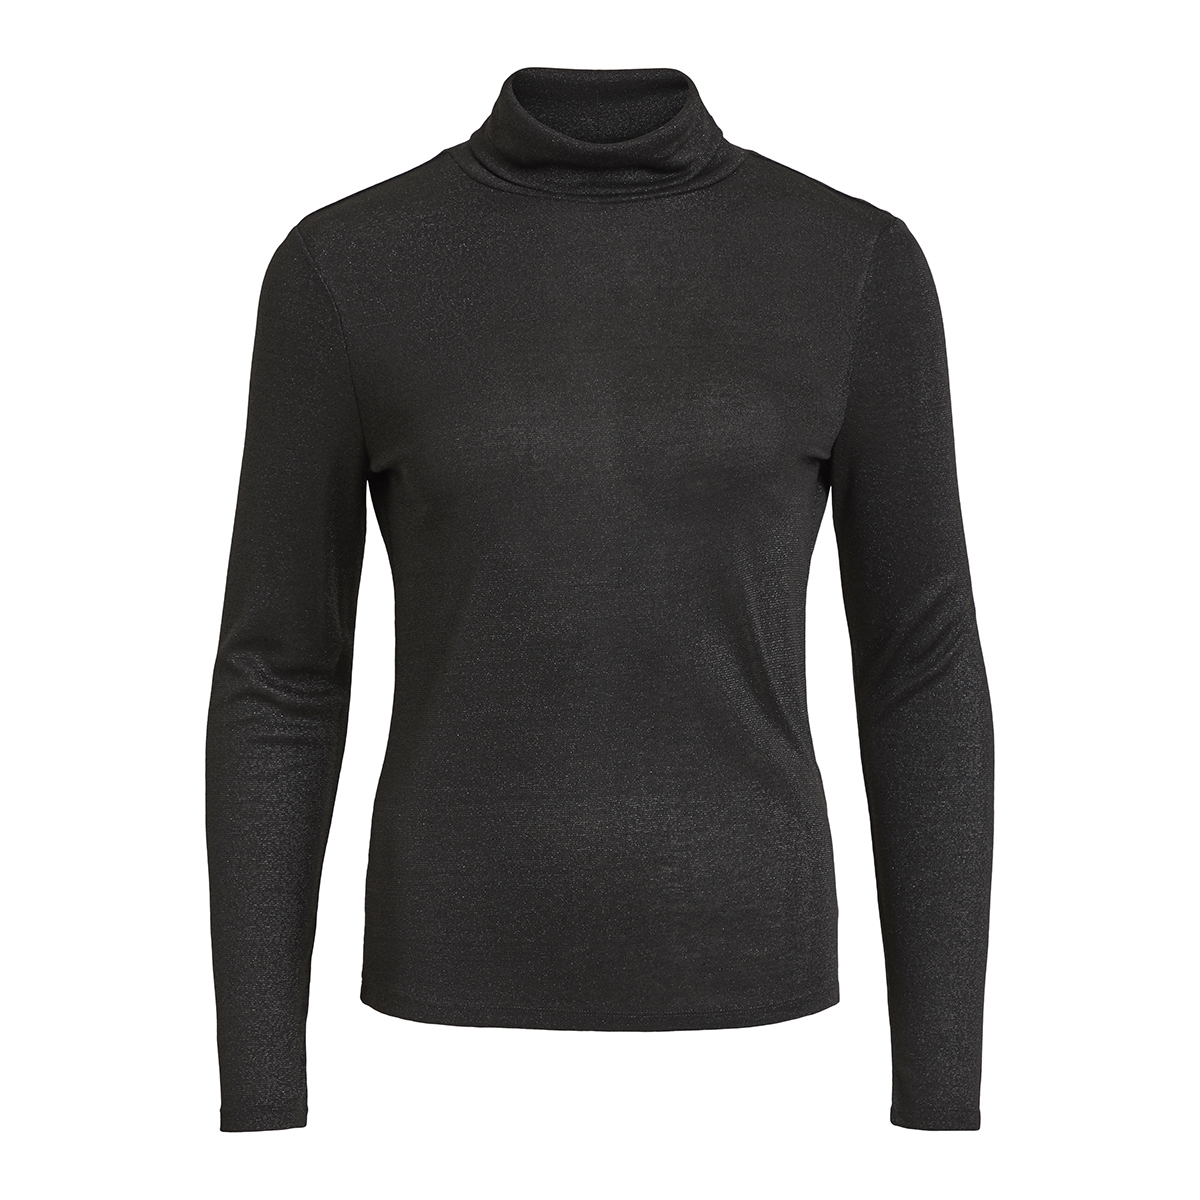 vifrola high neck l/s top cc 14049184 vila t-shirt black/lurex